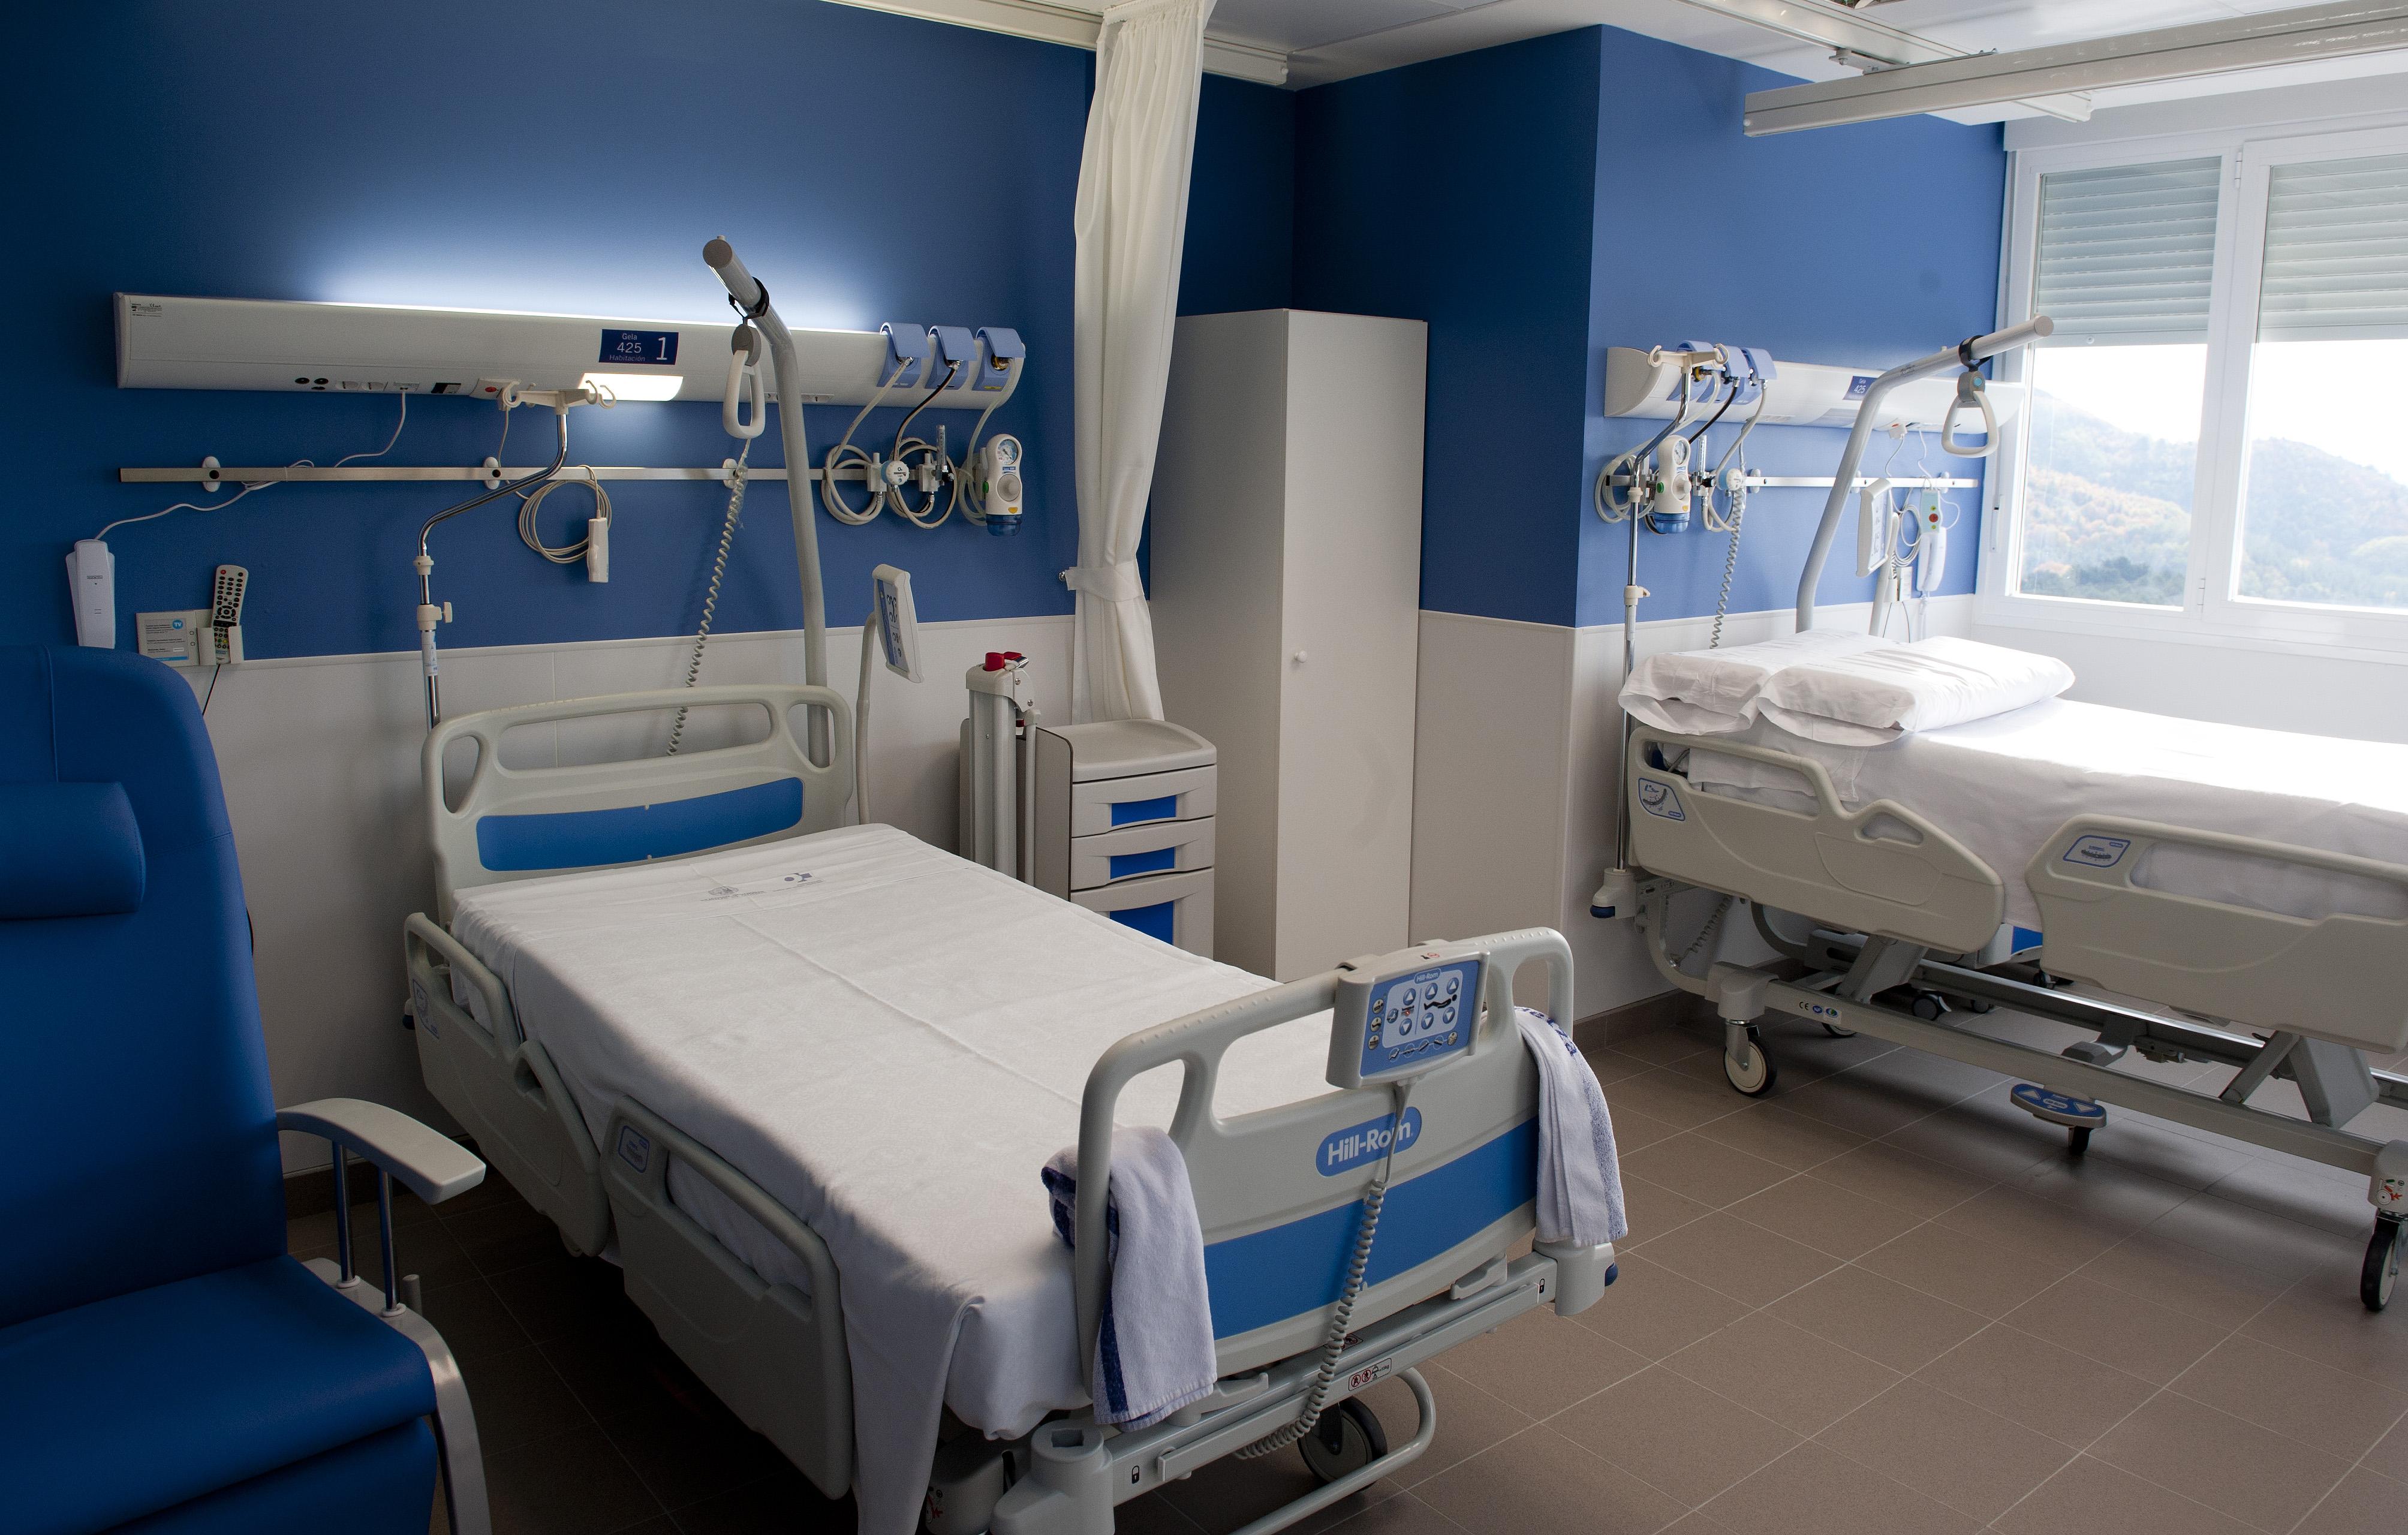 2012_11_09_bengoa_hospital_santa_marina_05.jpg